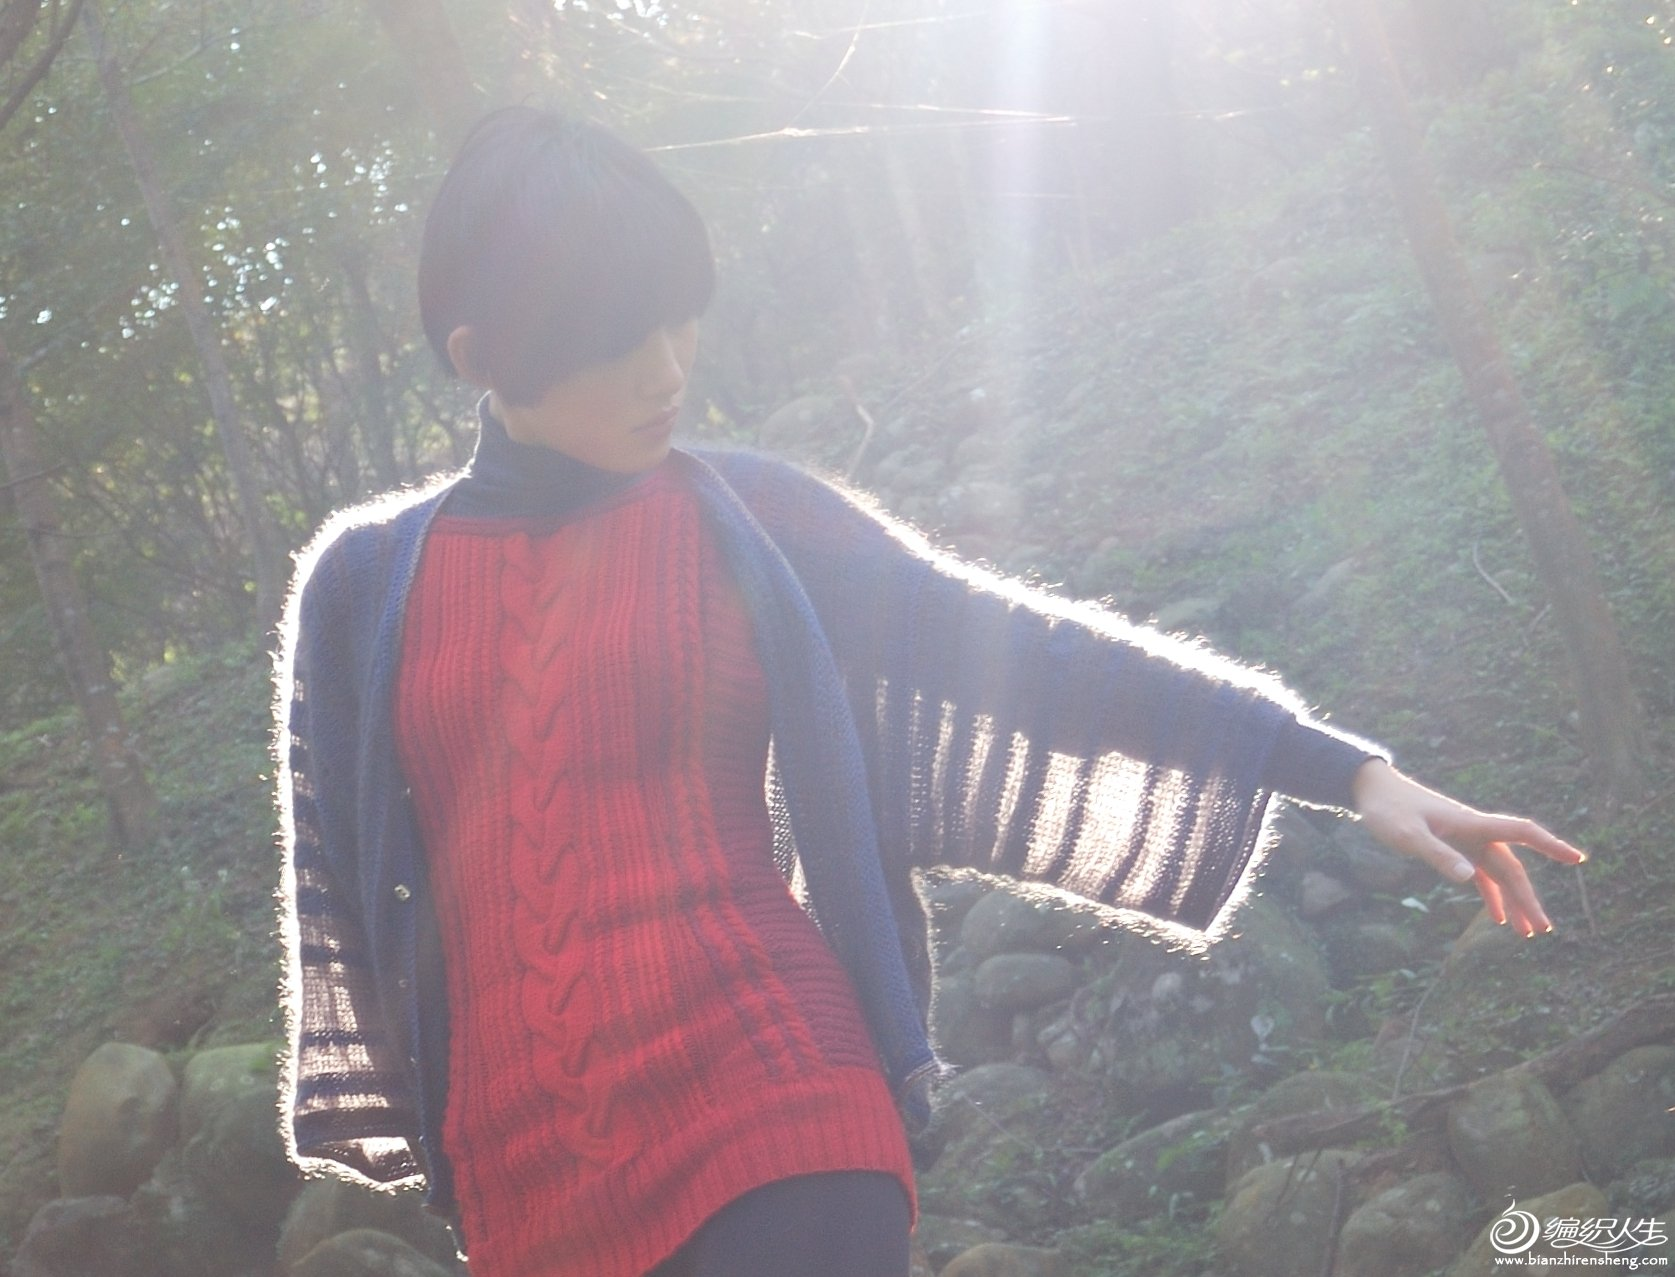 DSC_0046_01.JPG